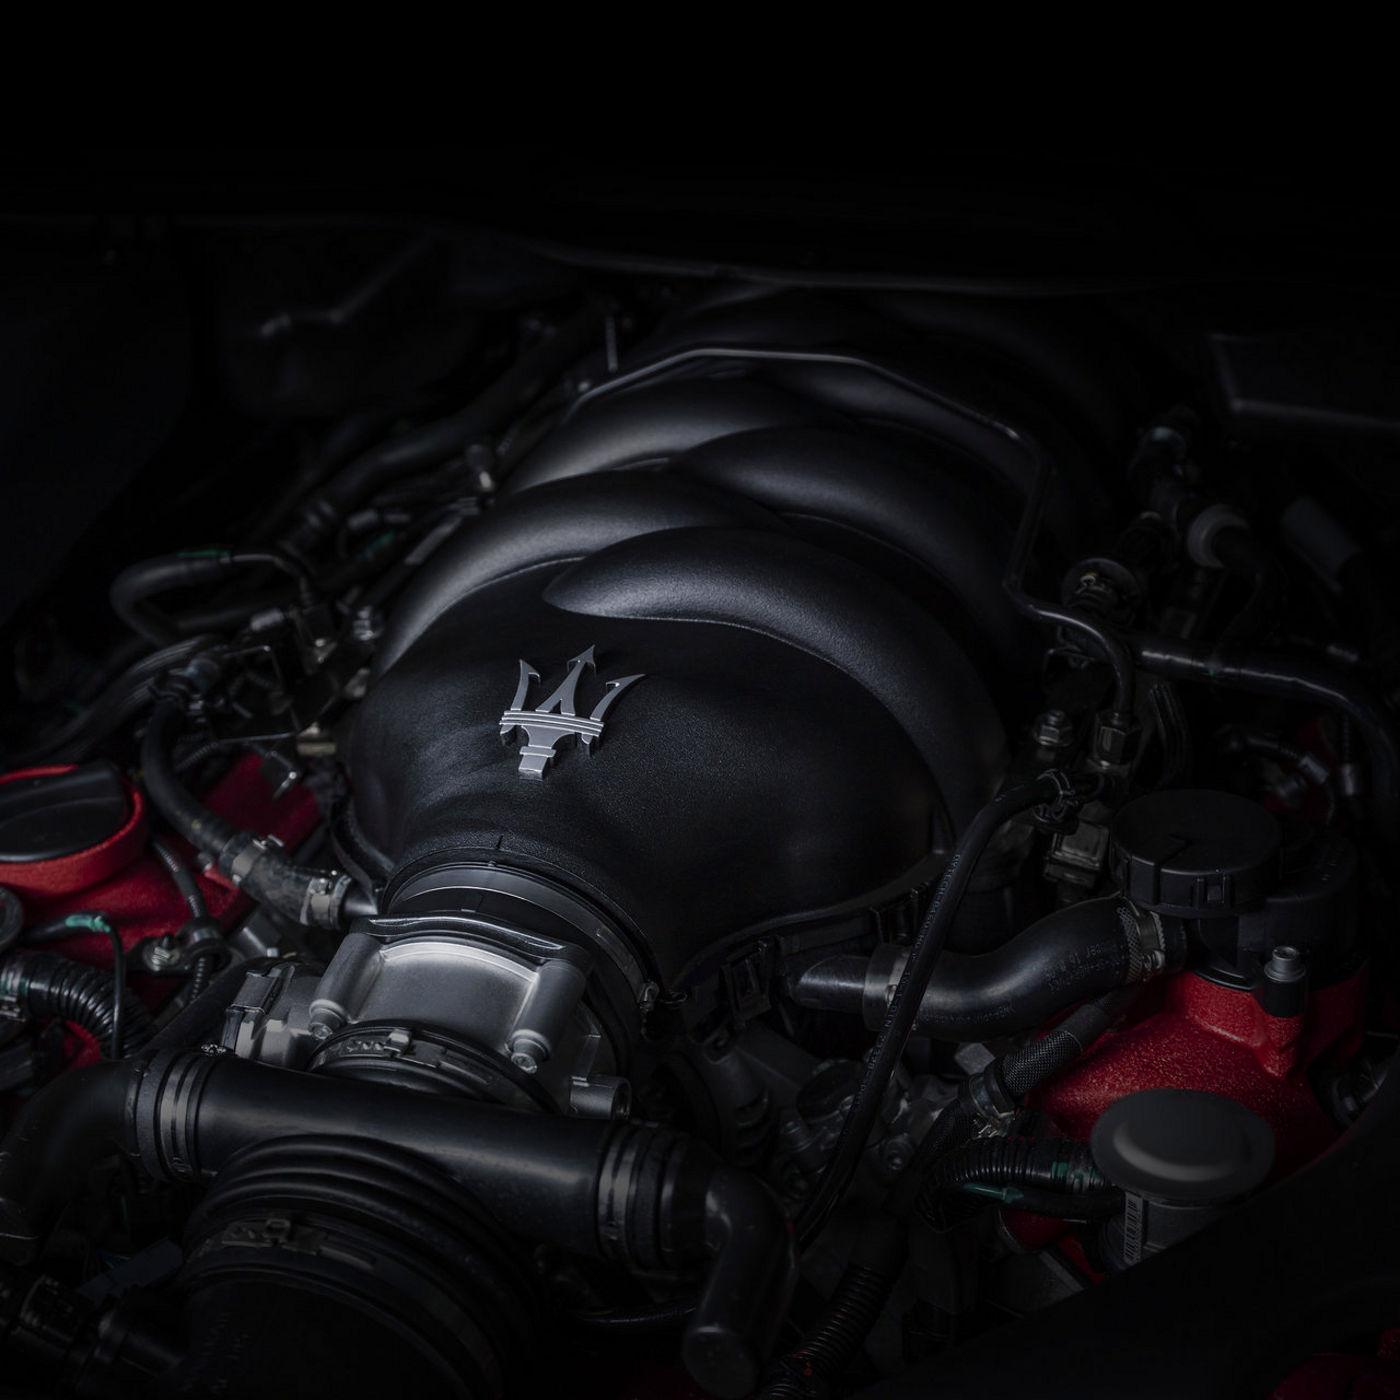 Maserati GranTurismo - Détail performance moteur